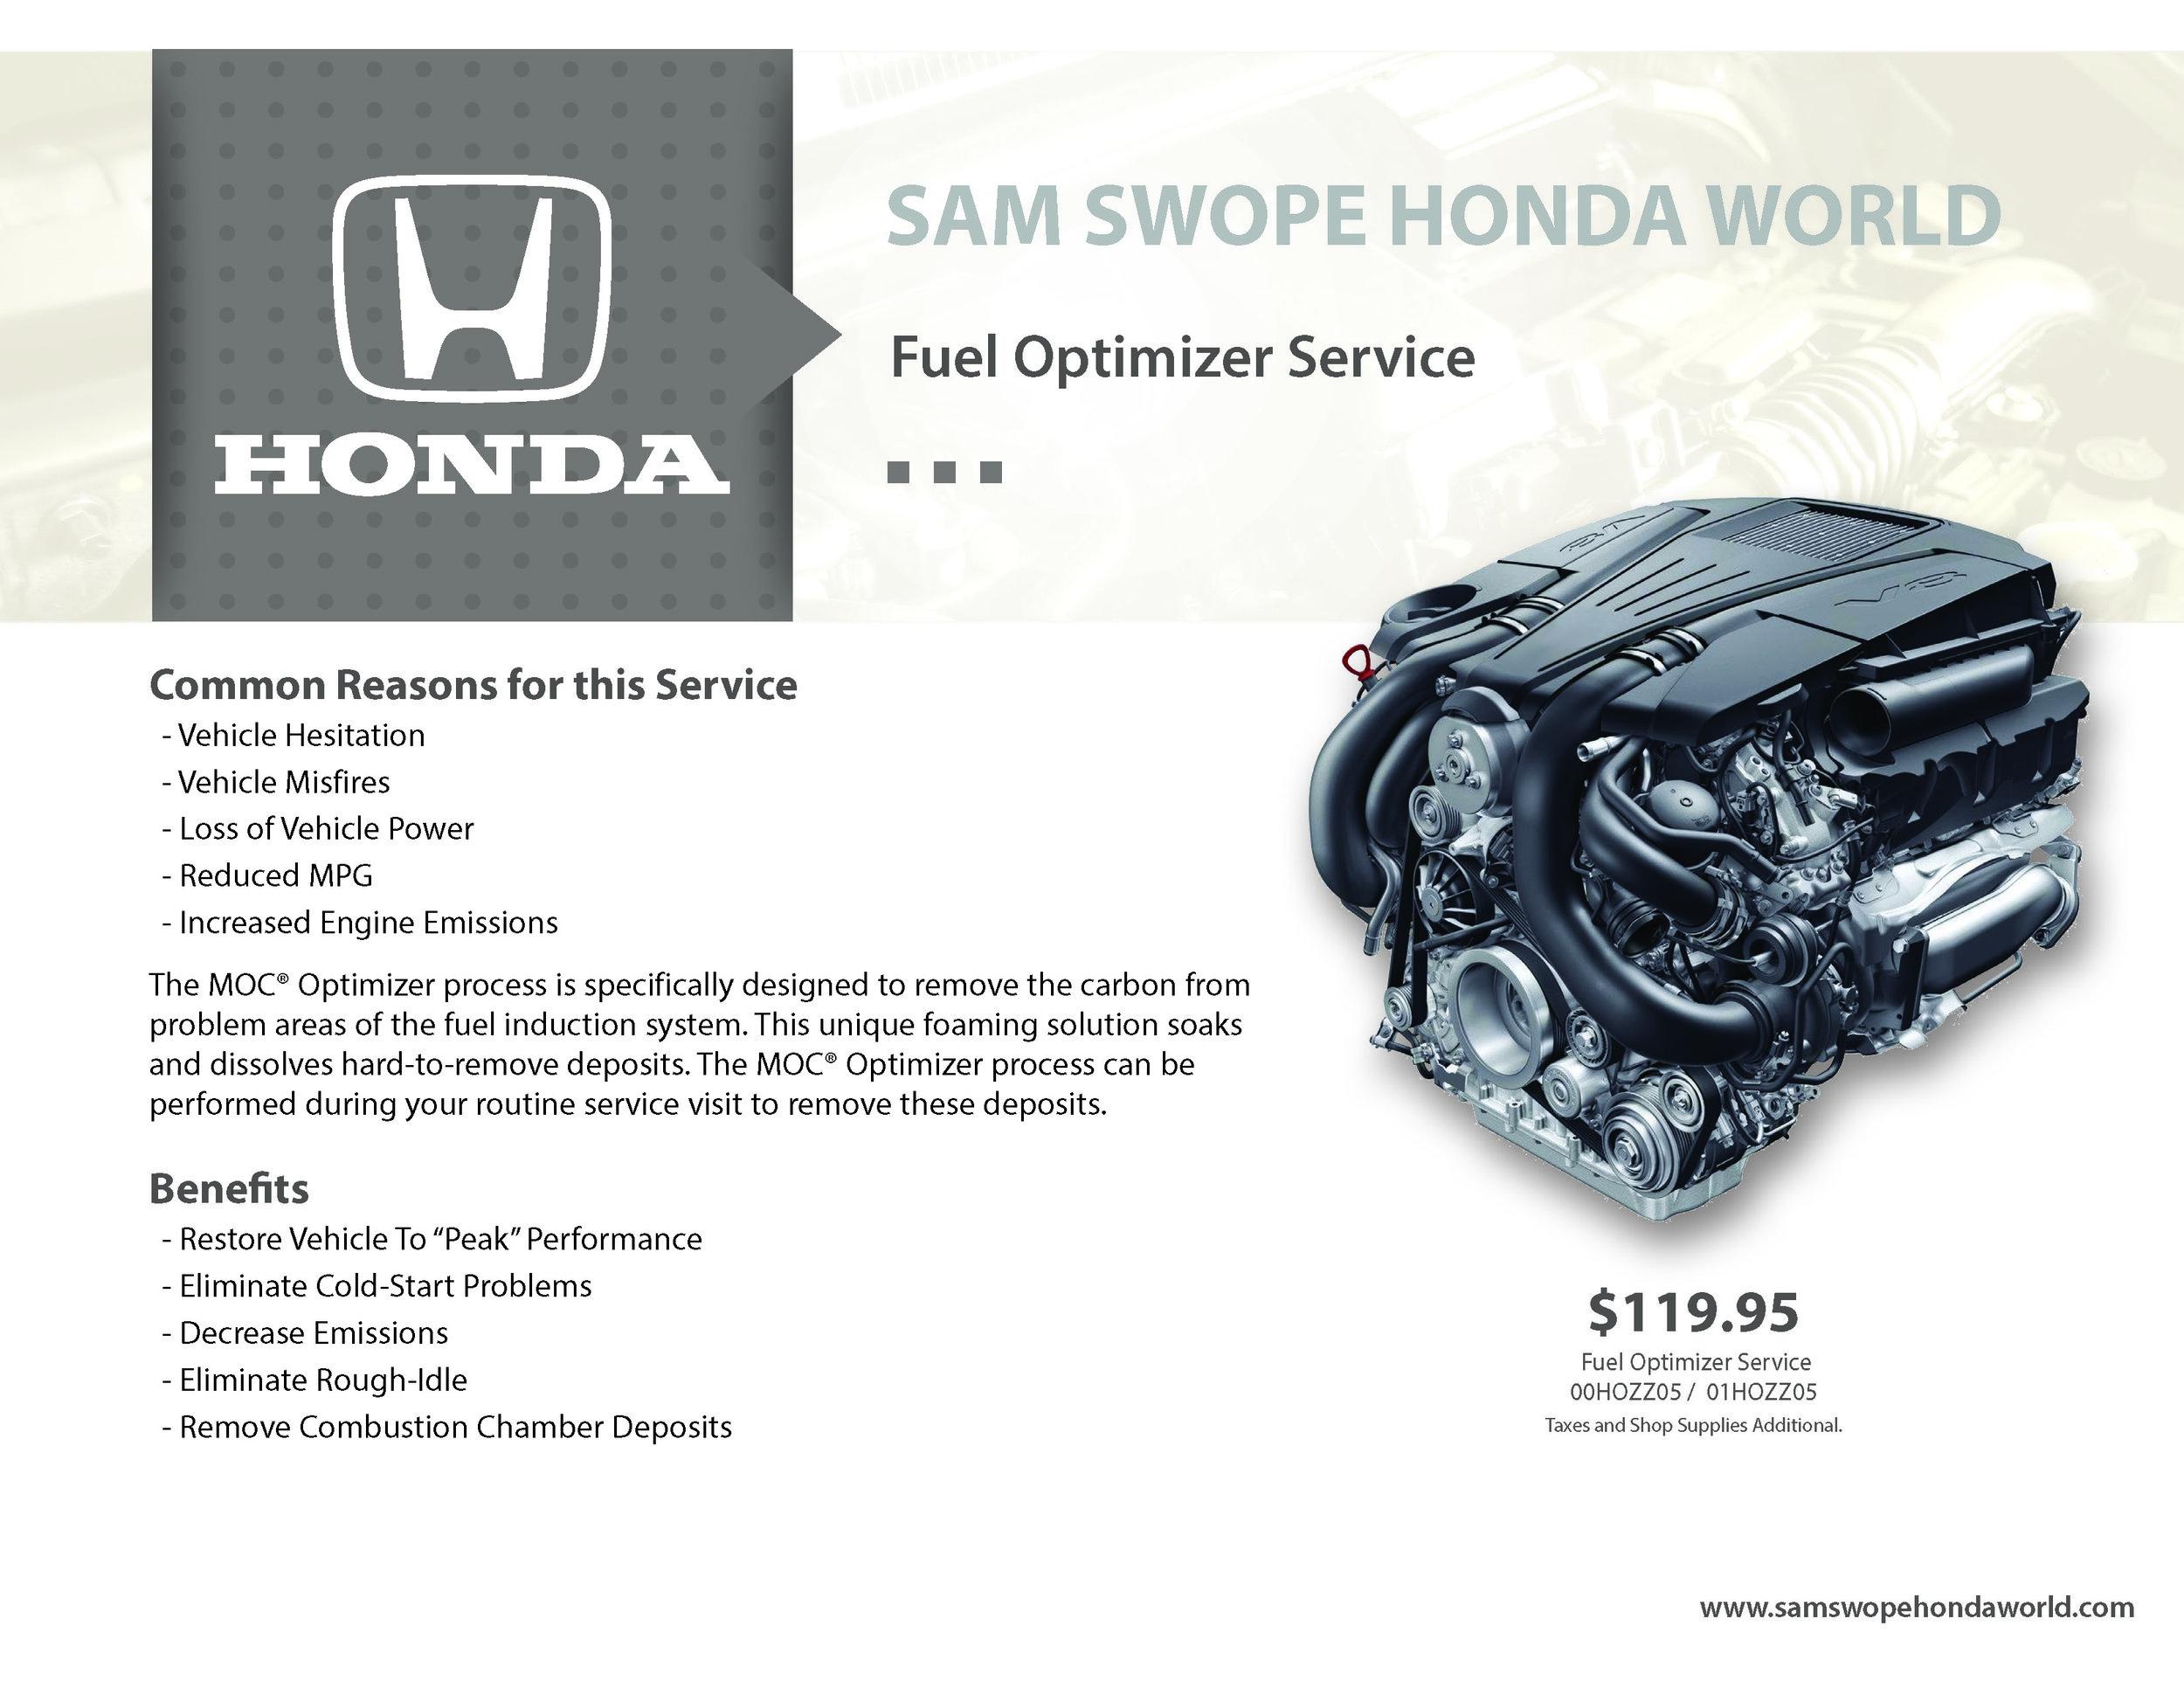 Swope Honda - A la carte - FO.jpg